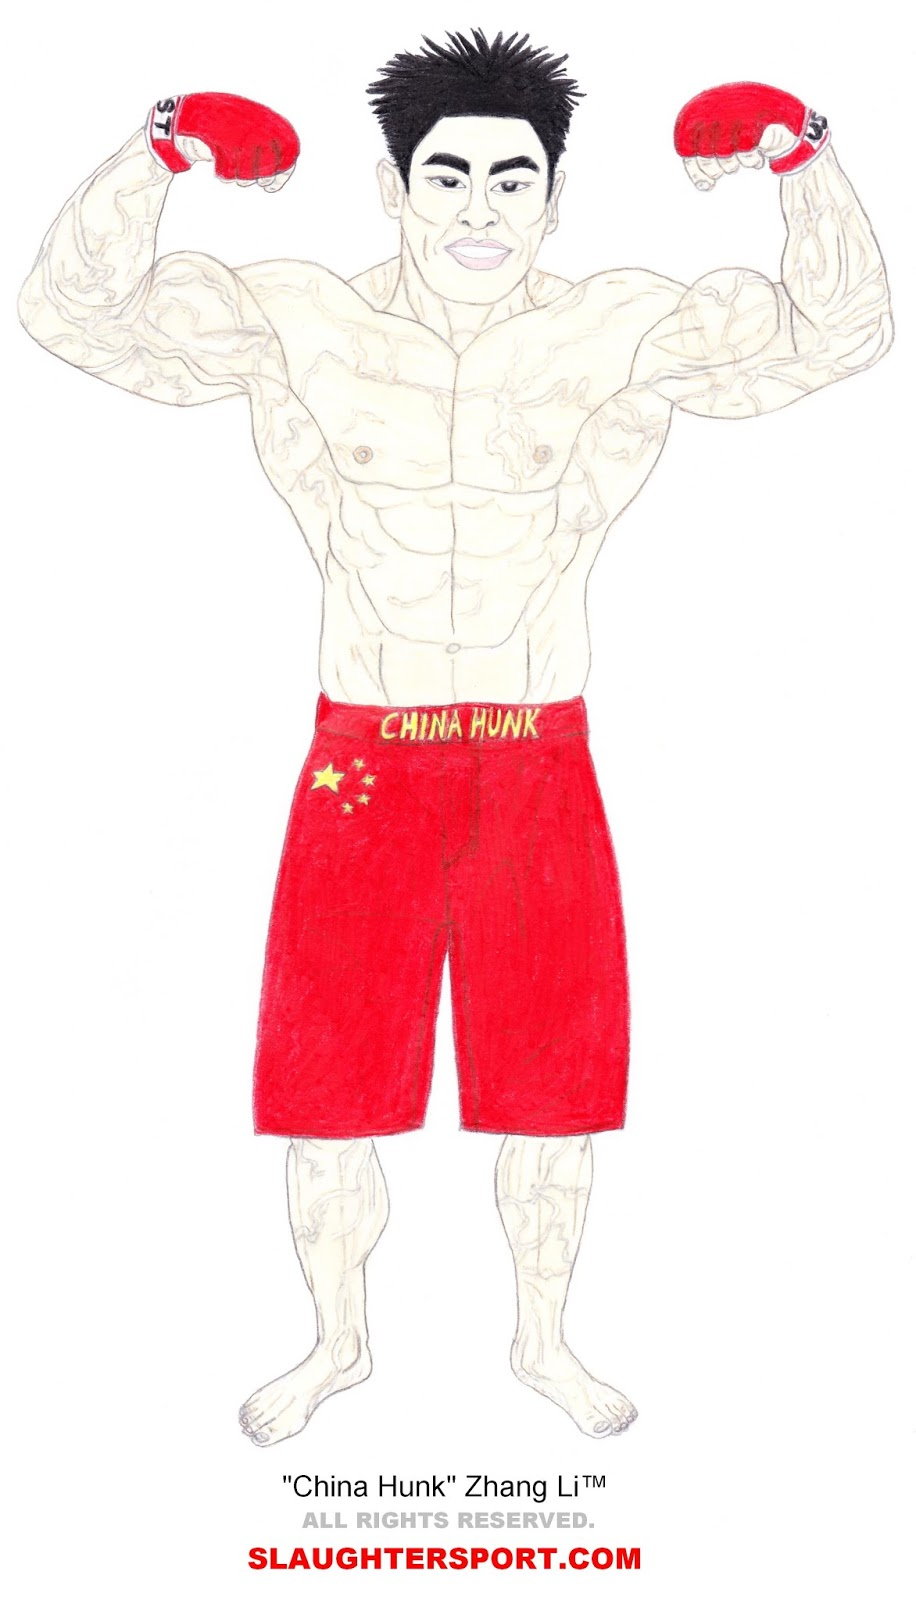 CHINA HUNK Zhang Li - Chinese UST Combatant SLAUGHTERSPORT.COM